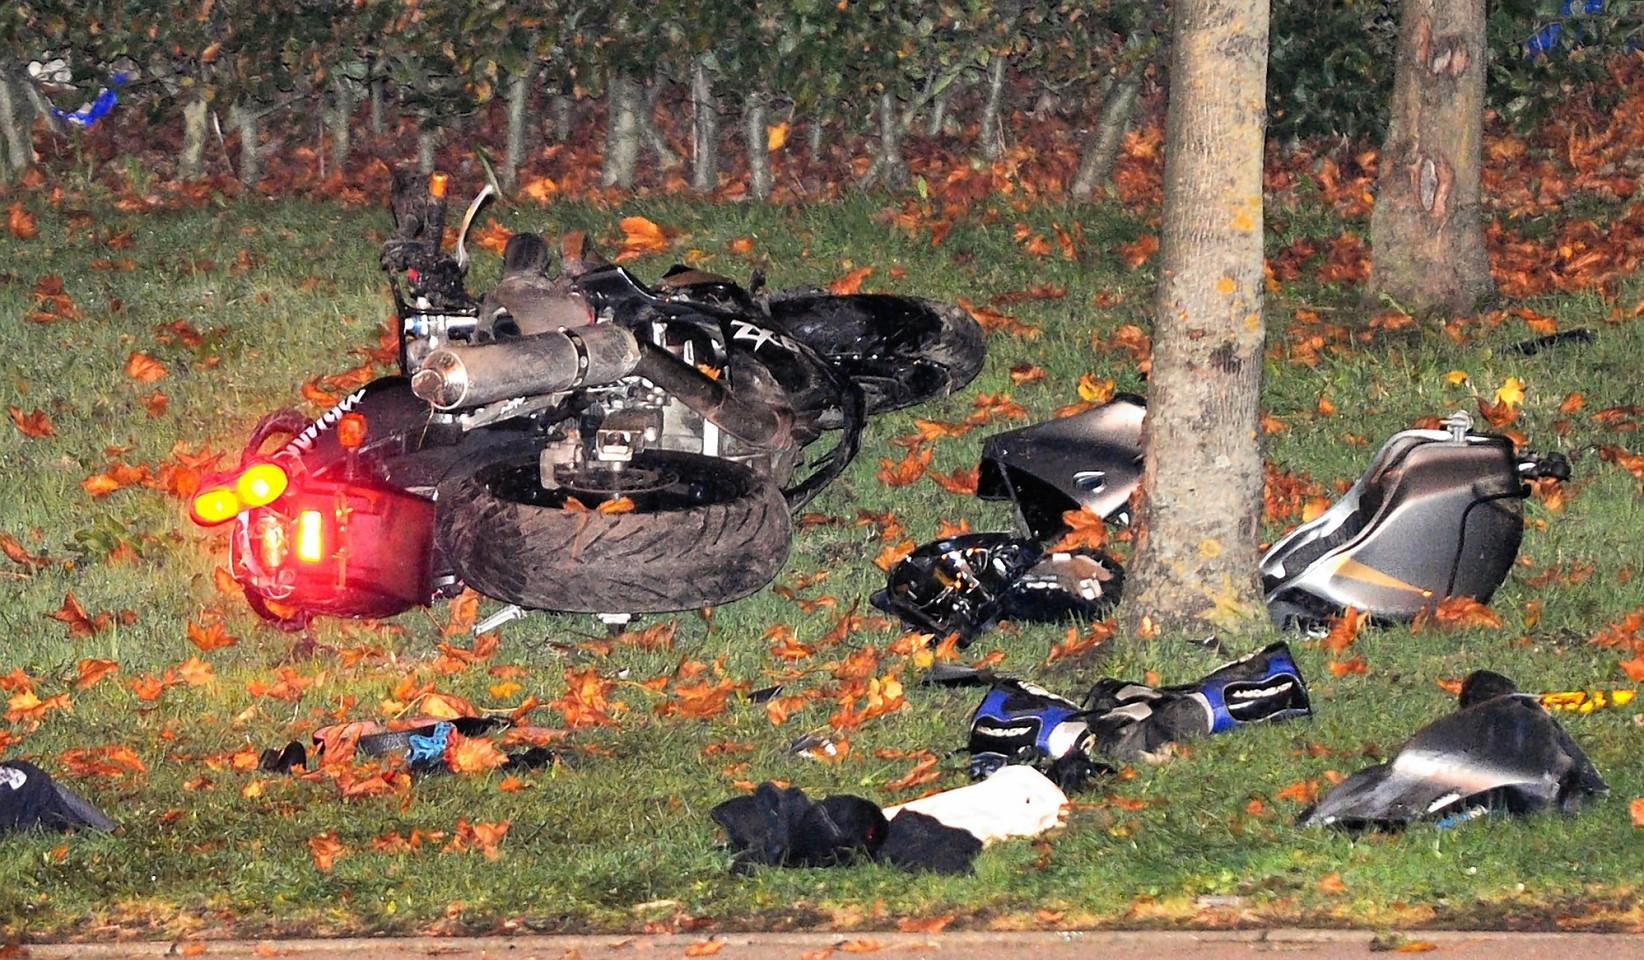 The Kawasaki following the crash near Altens. Credit: Kevin Emslie.